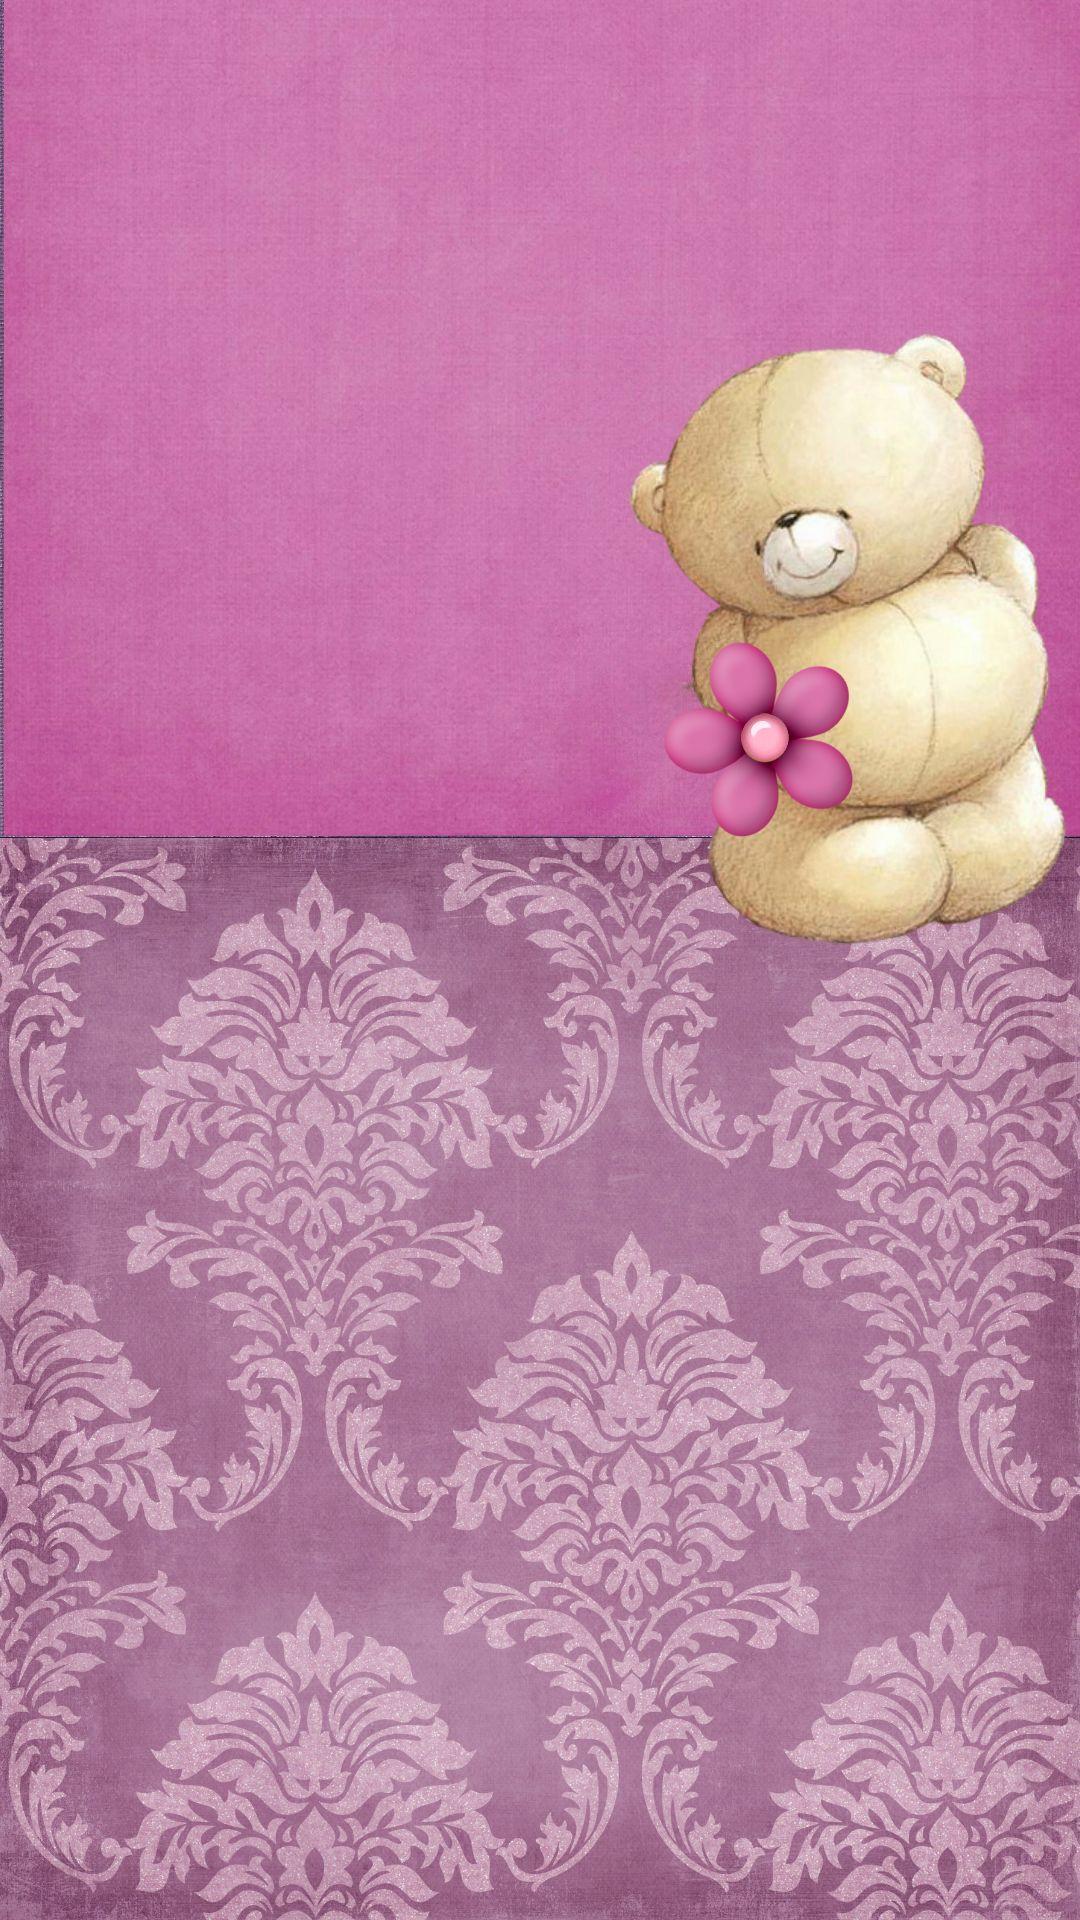 friends mobile wallpaper,pink,purple,violet,lilac,teddy bear